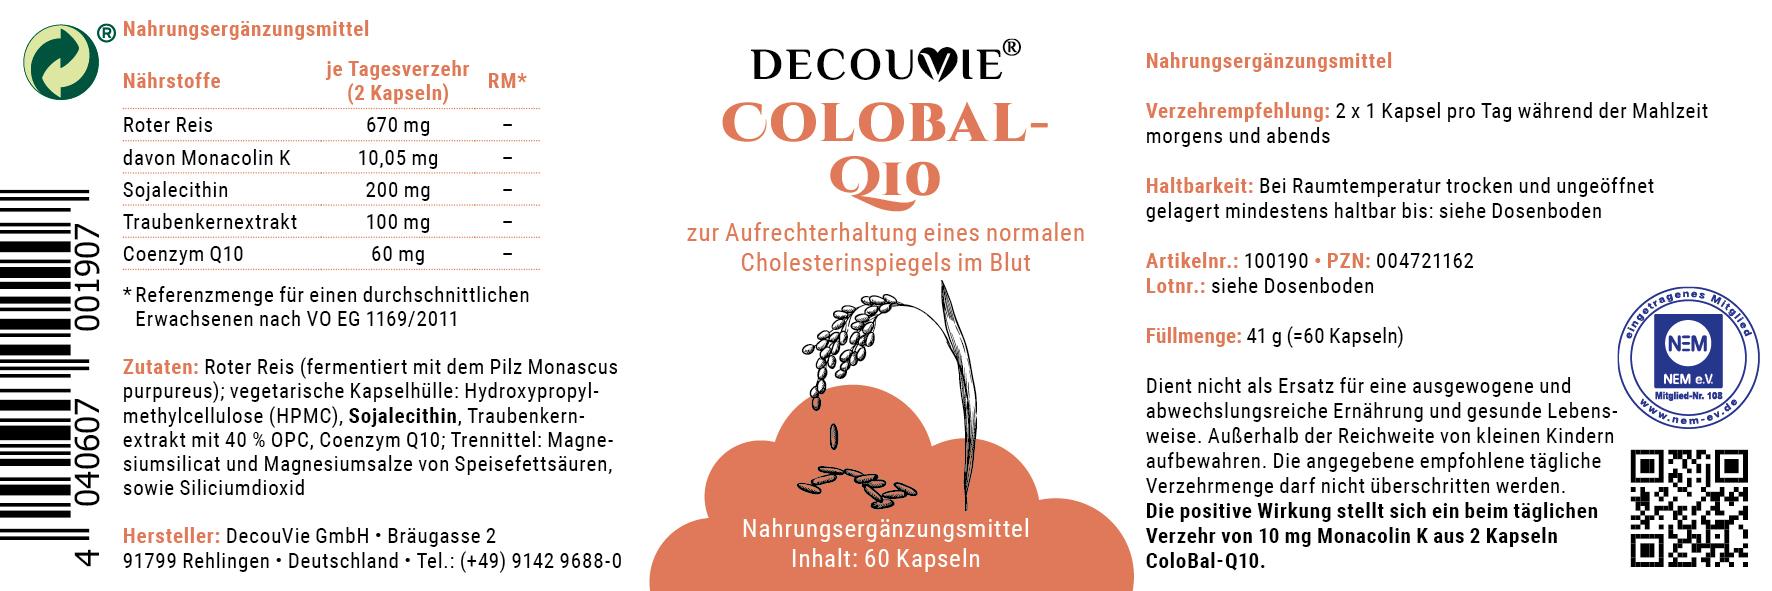 ColoBal-Q10, zur Optimierung des Cholesterinspiegels, 60 Kapseln